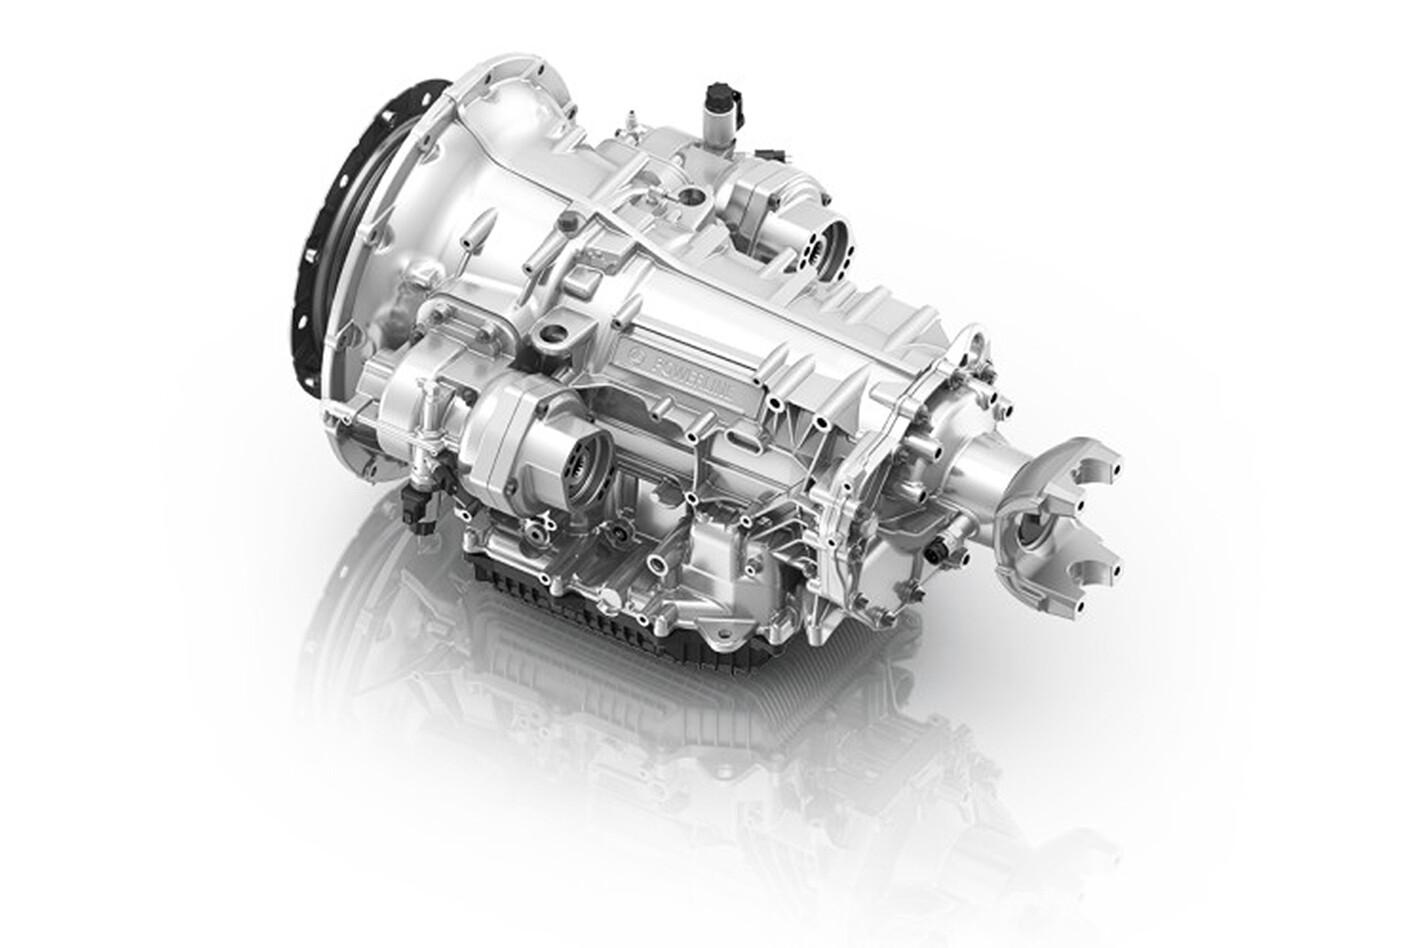 ZF PowerLine 8-speed automatic transmission